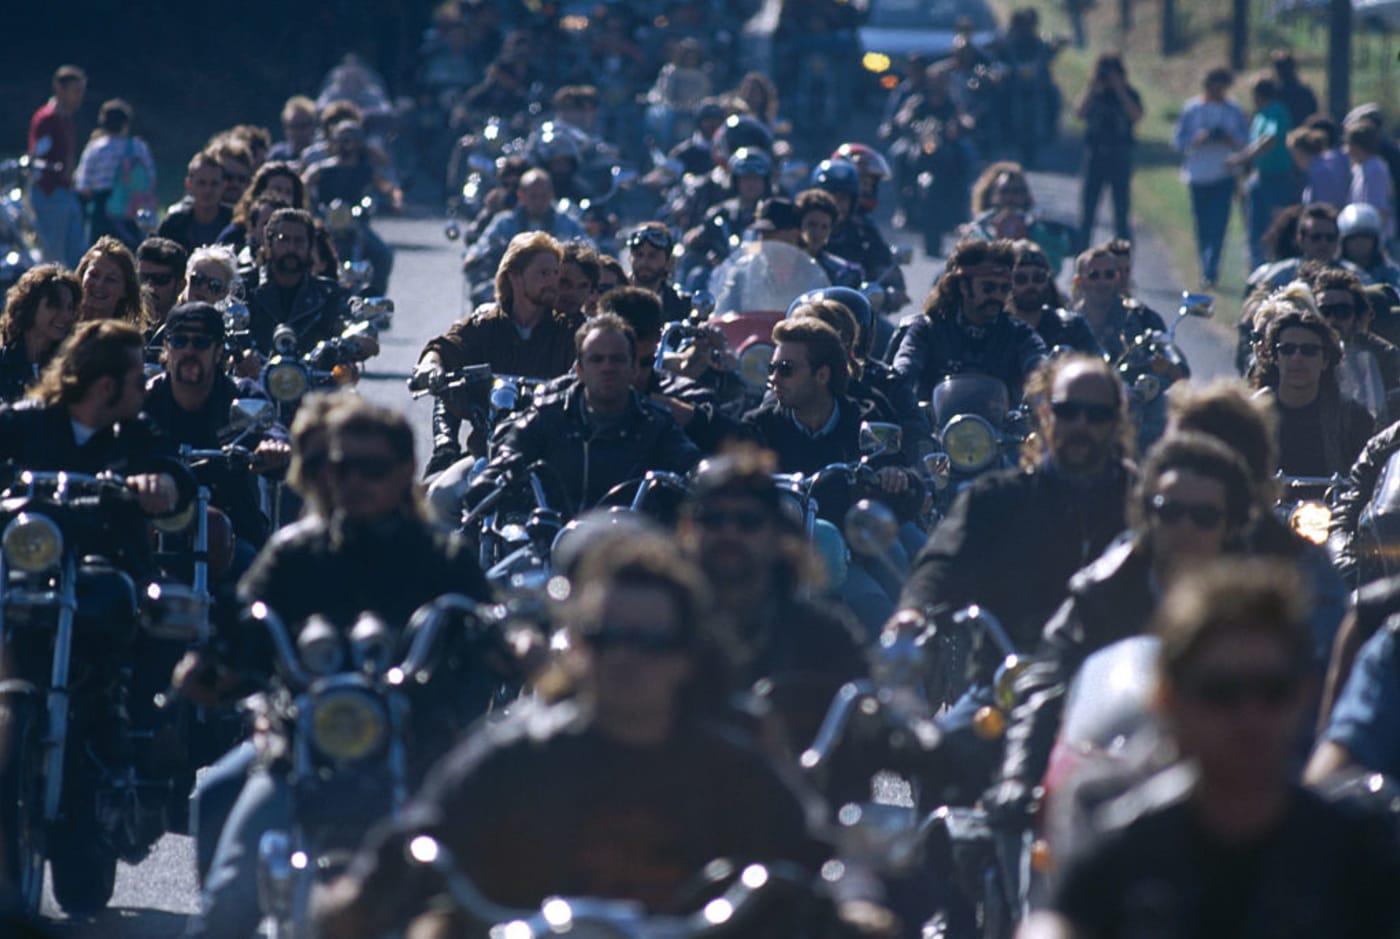 Group of bikers